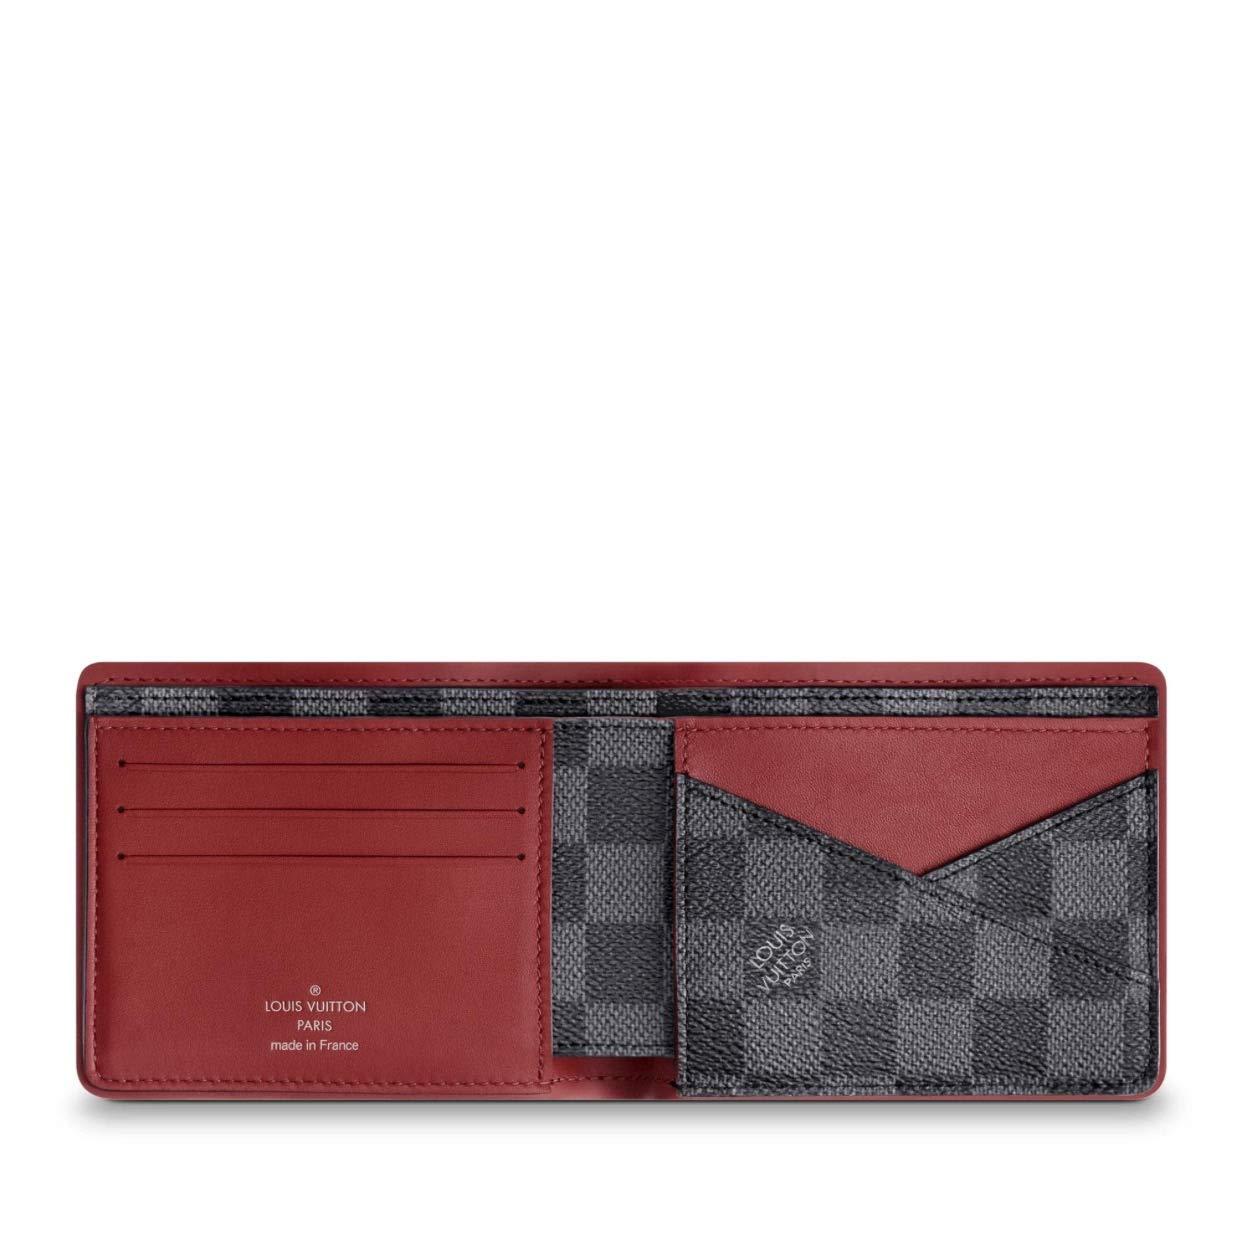 05038bf5 Louis Vuitton Damier Graphite Canvas Multiple Wallet N63260 at ...